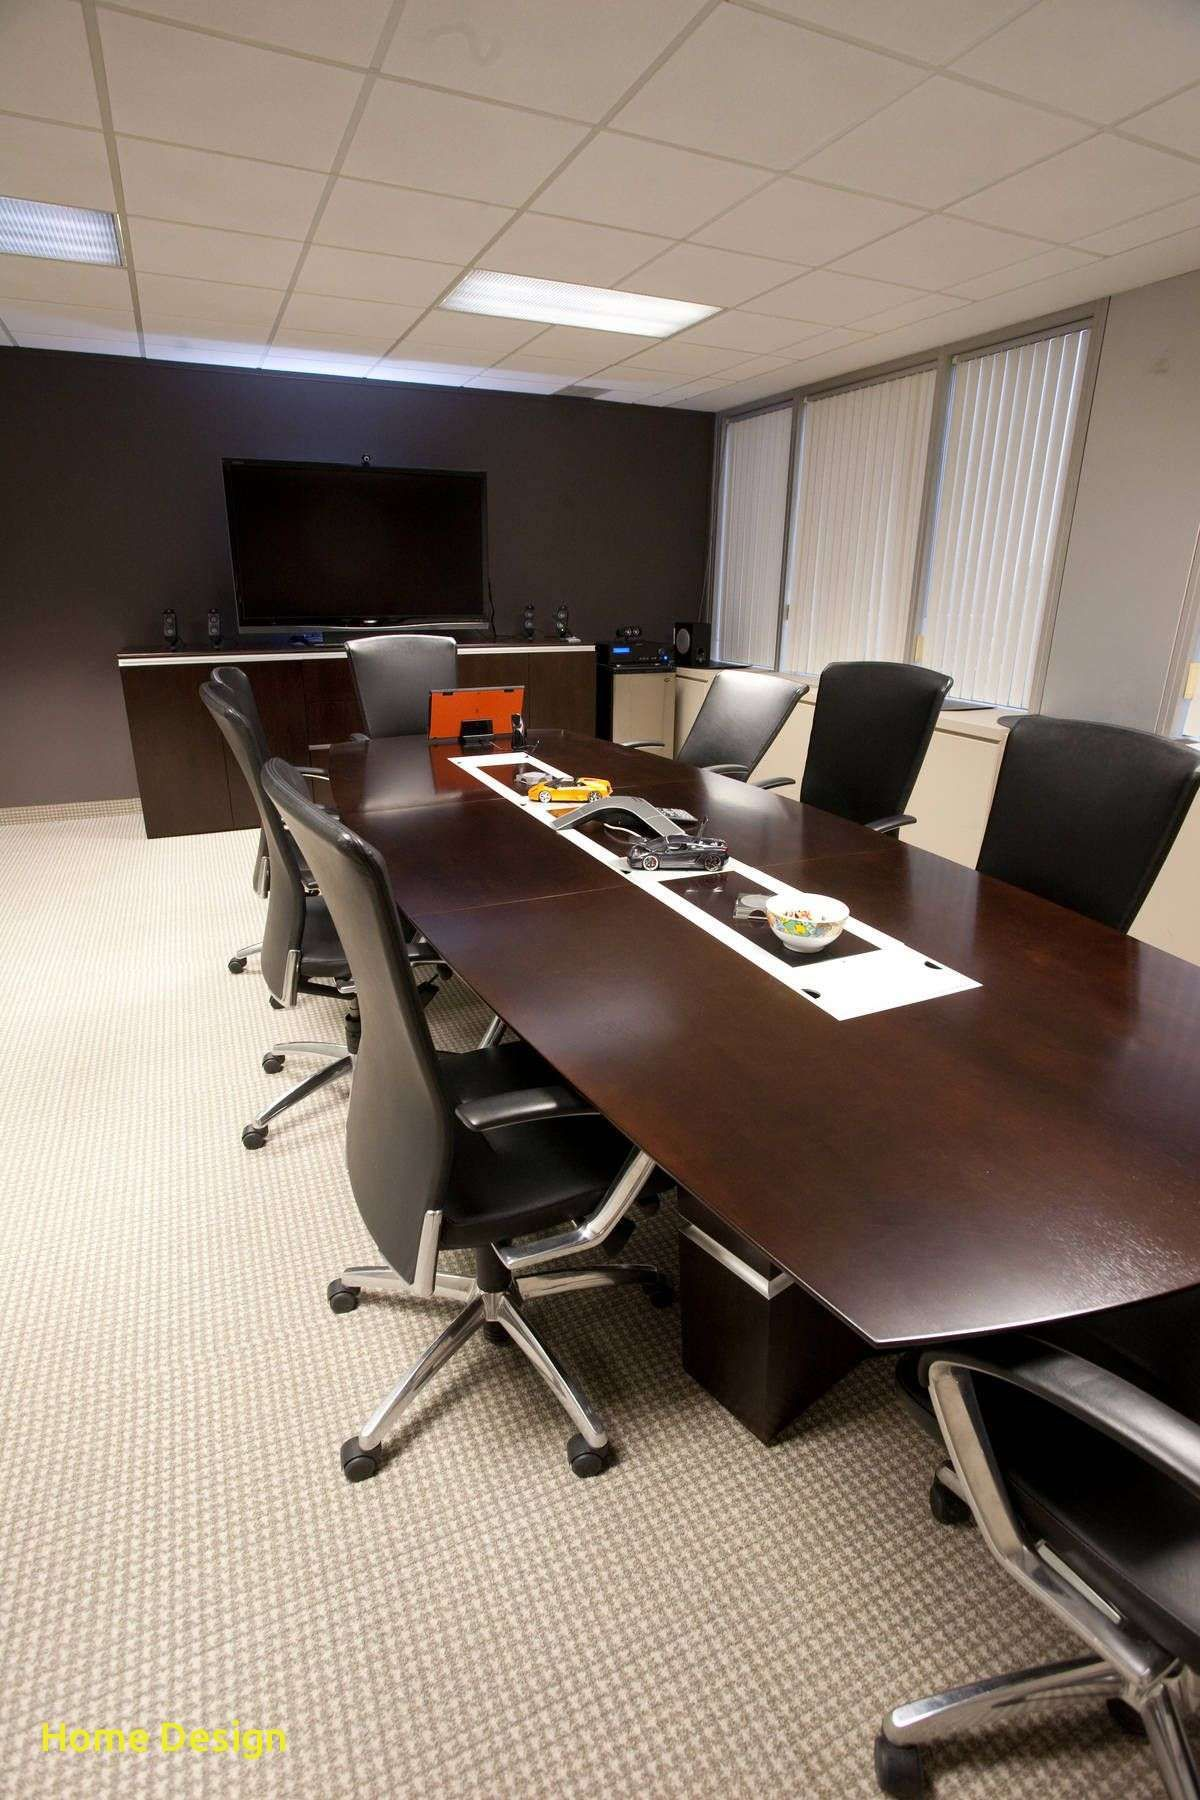 Cool Office Conference E Reveal Their Unique Designs Idea Room Design